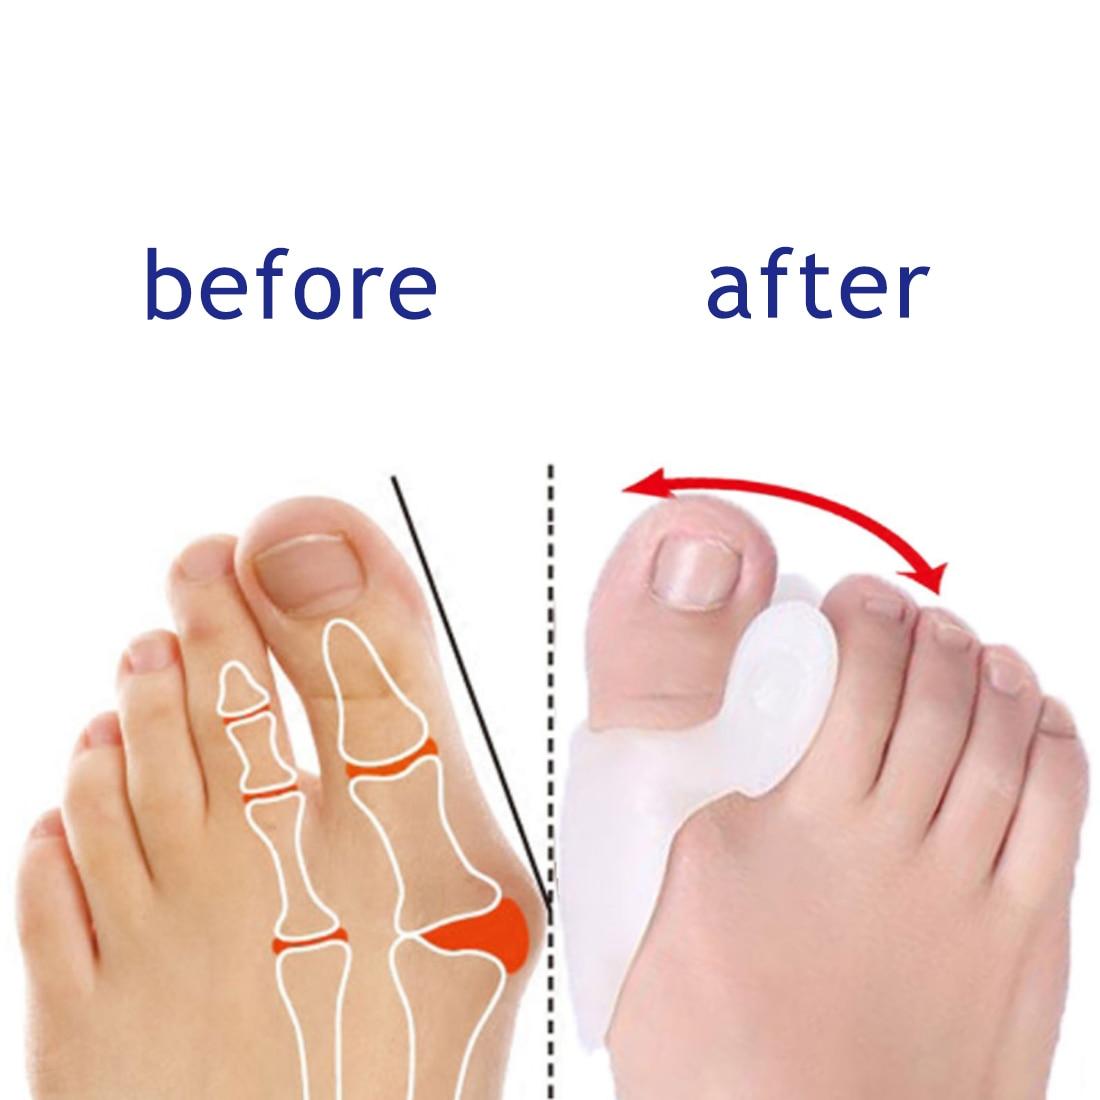 1Pair Silicone Gel Thumb Set Big Toe Separator Protector Relieve Foot Pain Foot Hallux Valgus Correction Pad Toe Braces